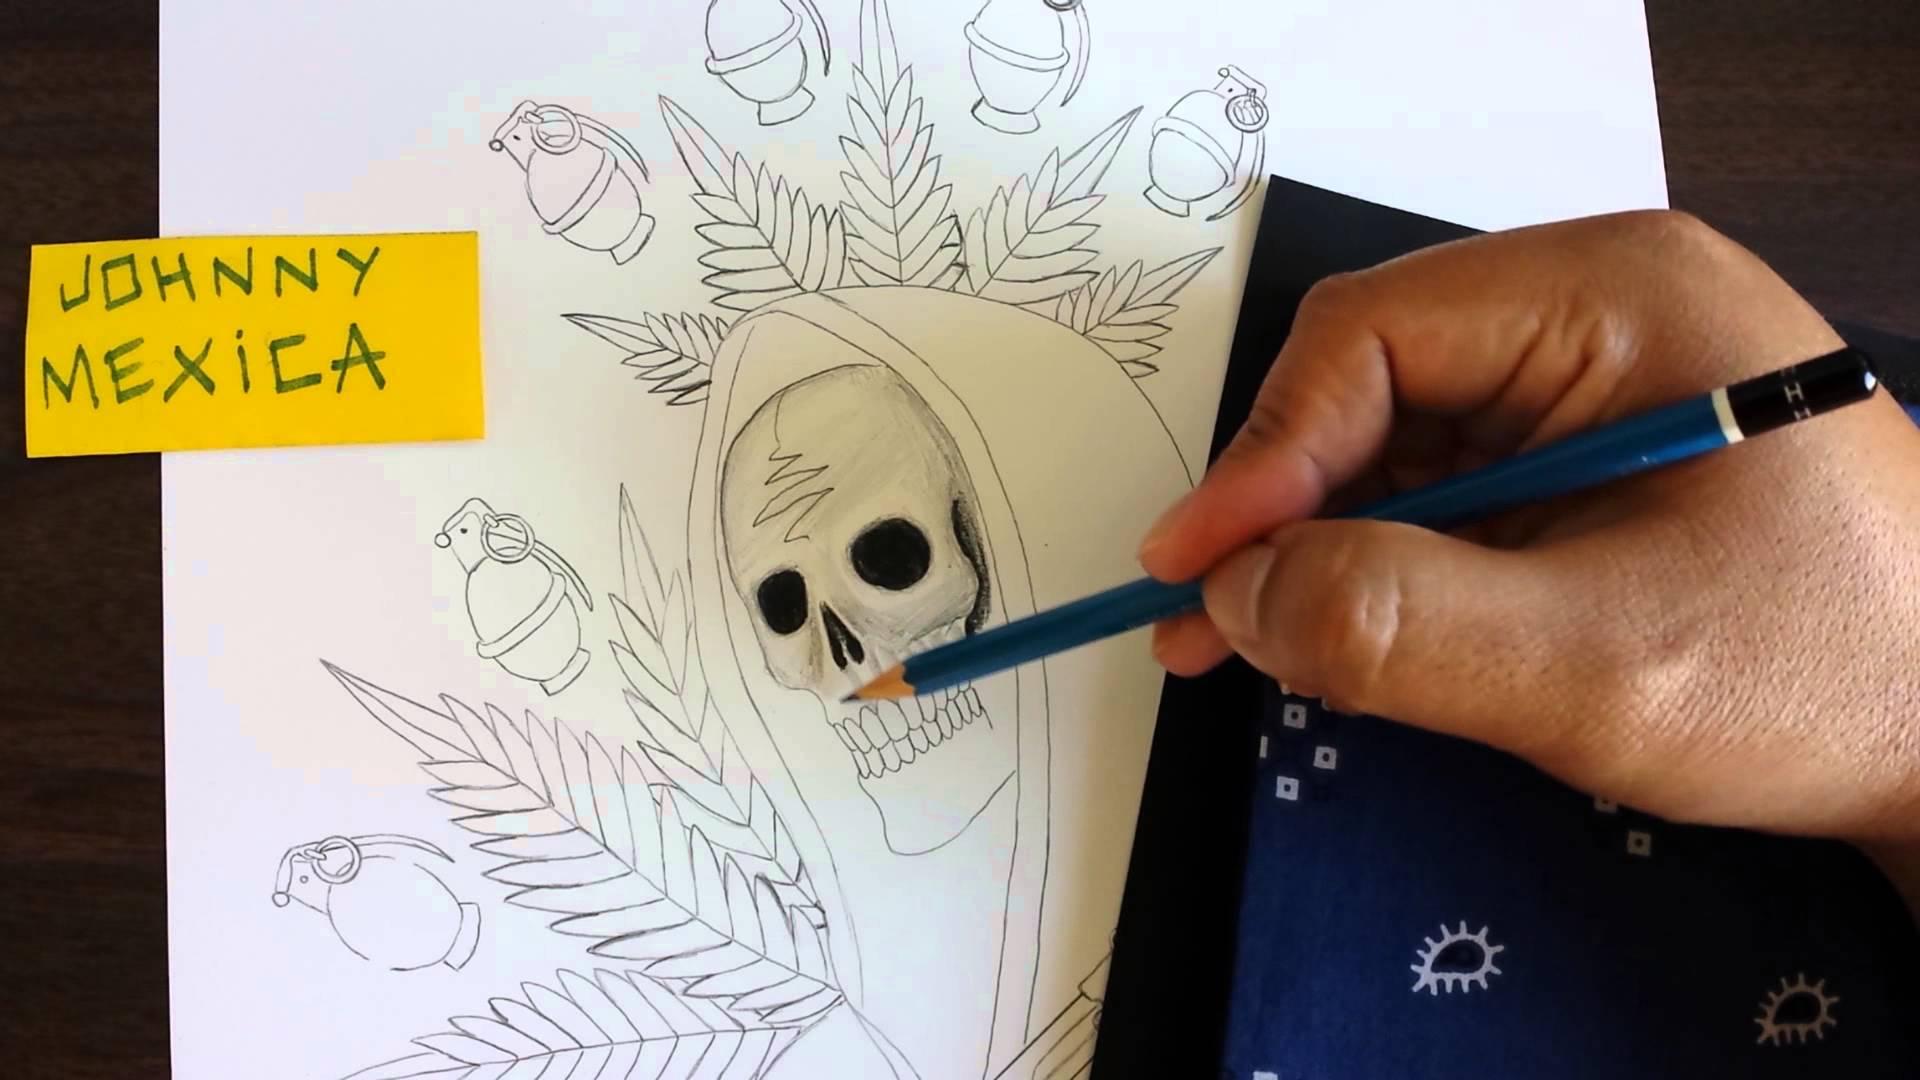 Drawn grim reaper graffiti How grim and reaper draw